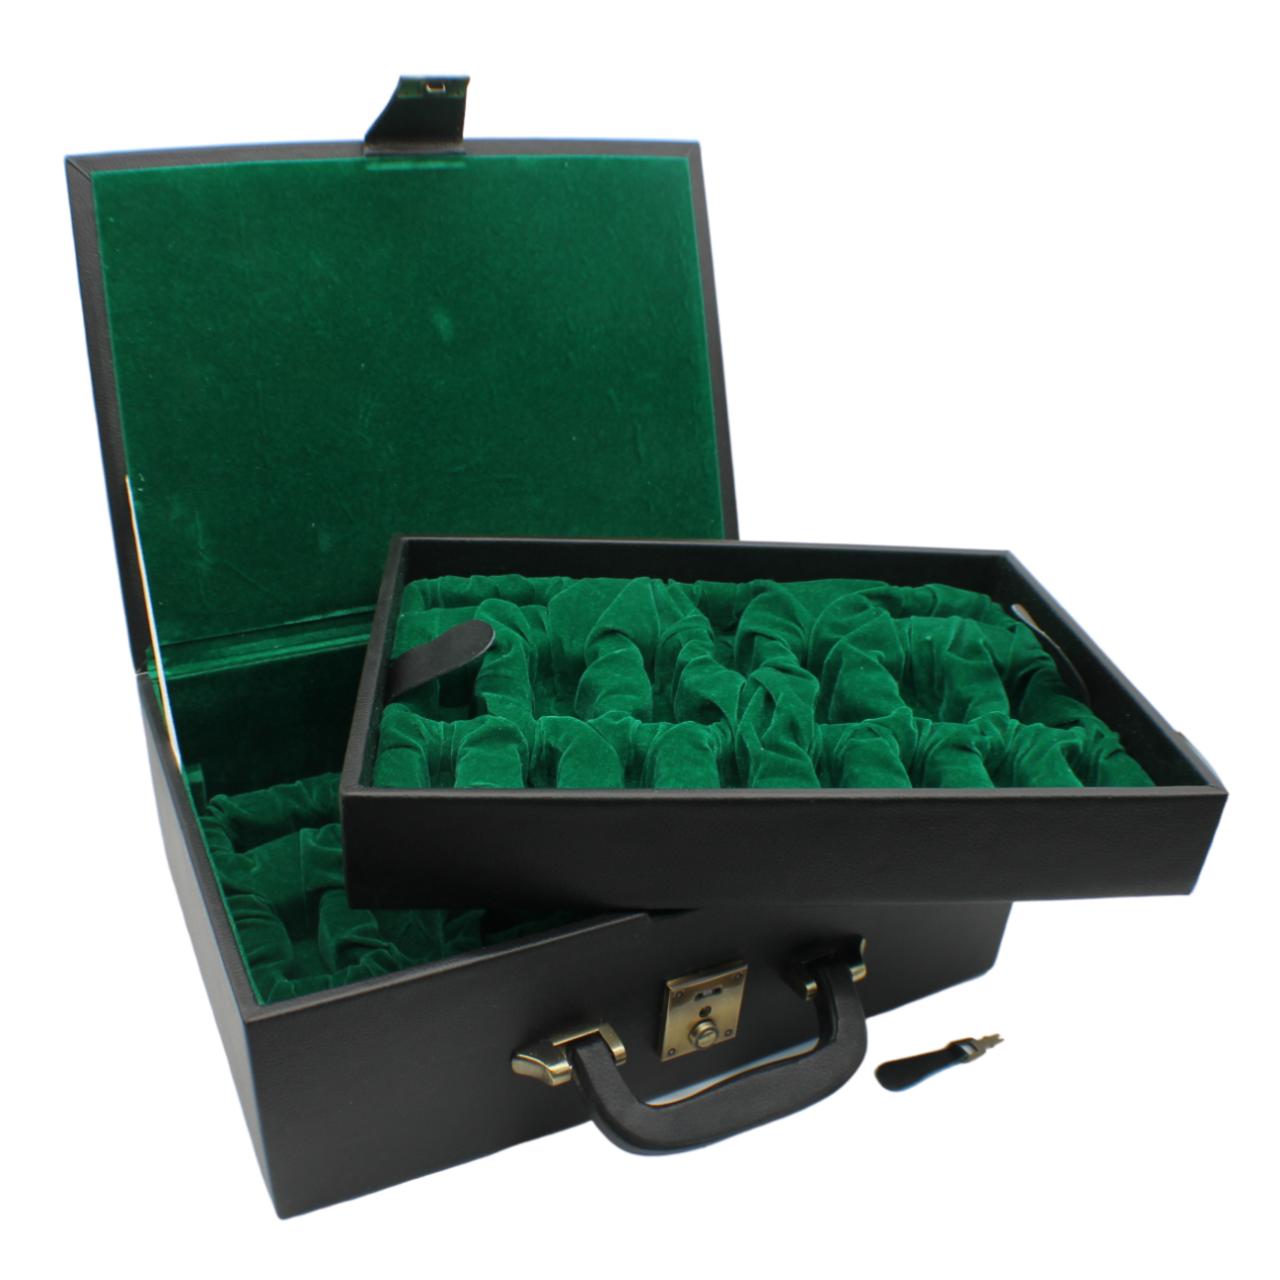 Rex Noir Chess Storage Box Black Organic Leather for 95mm pieces (BOX-L-11)